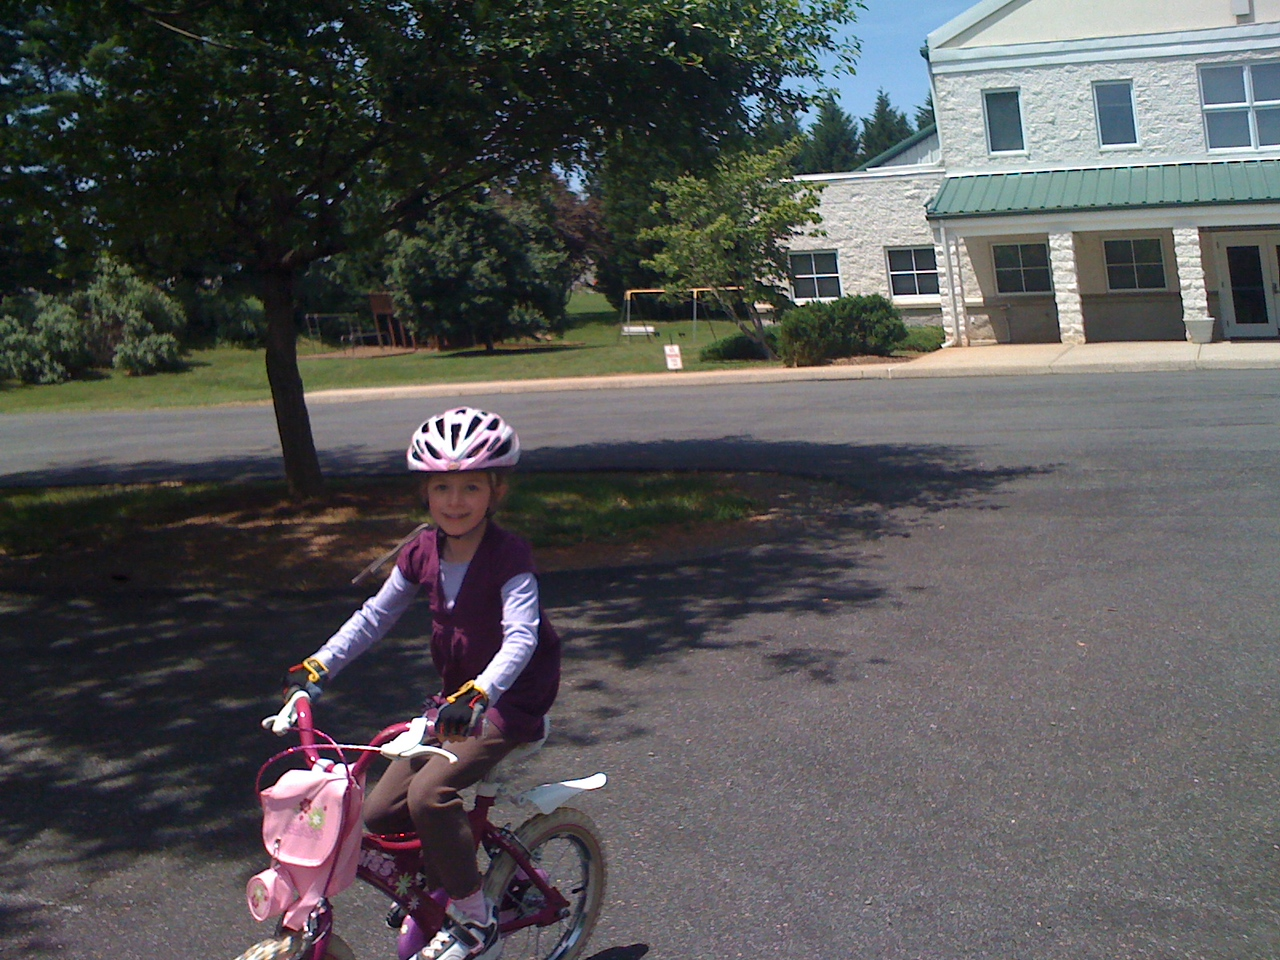 Church parking lot rider